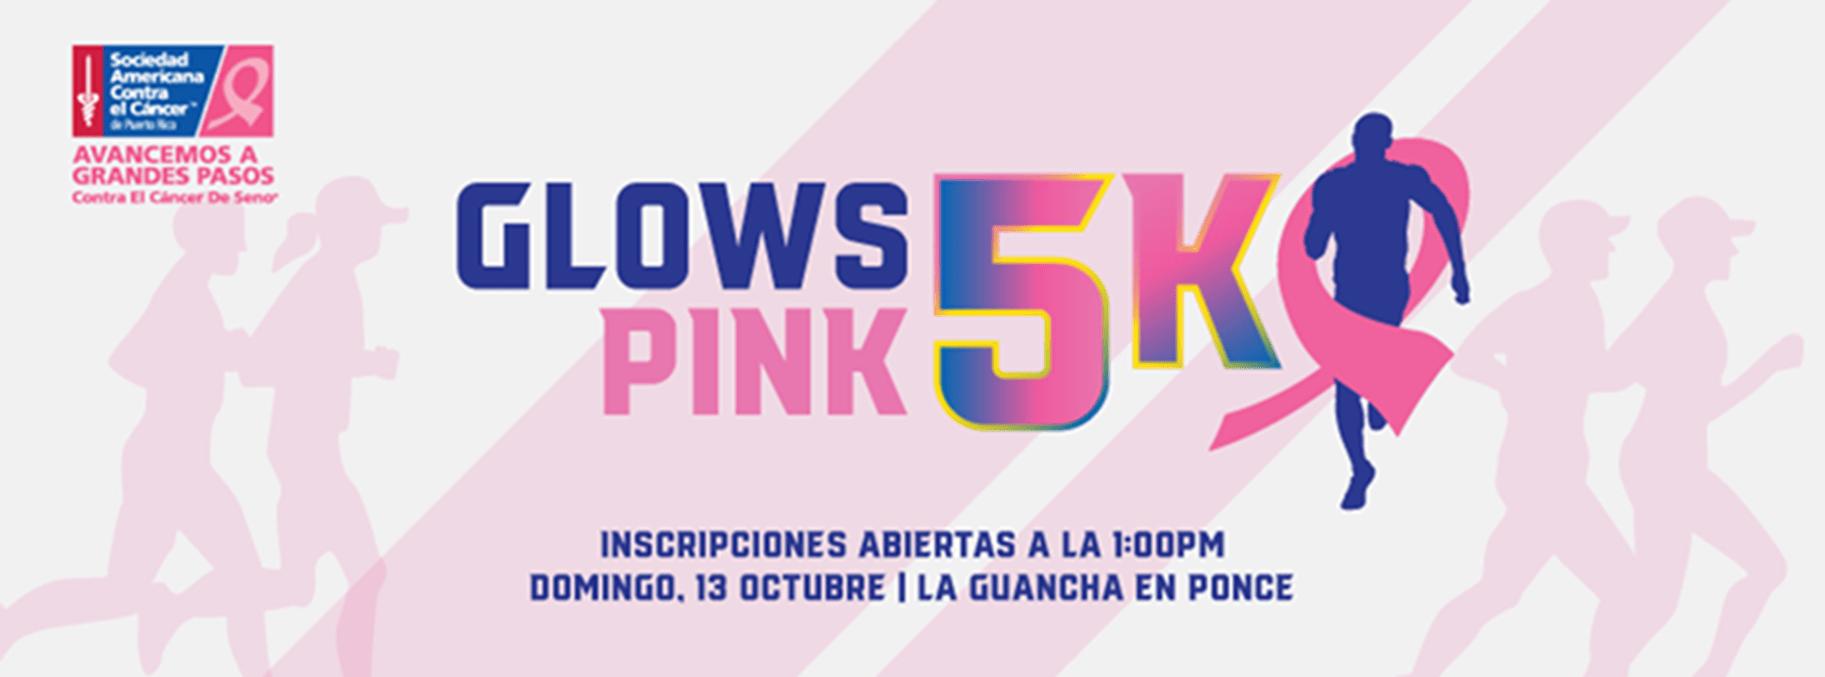 Ponce Glows Pink 5k 2019